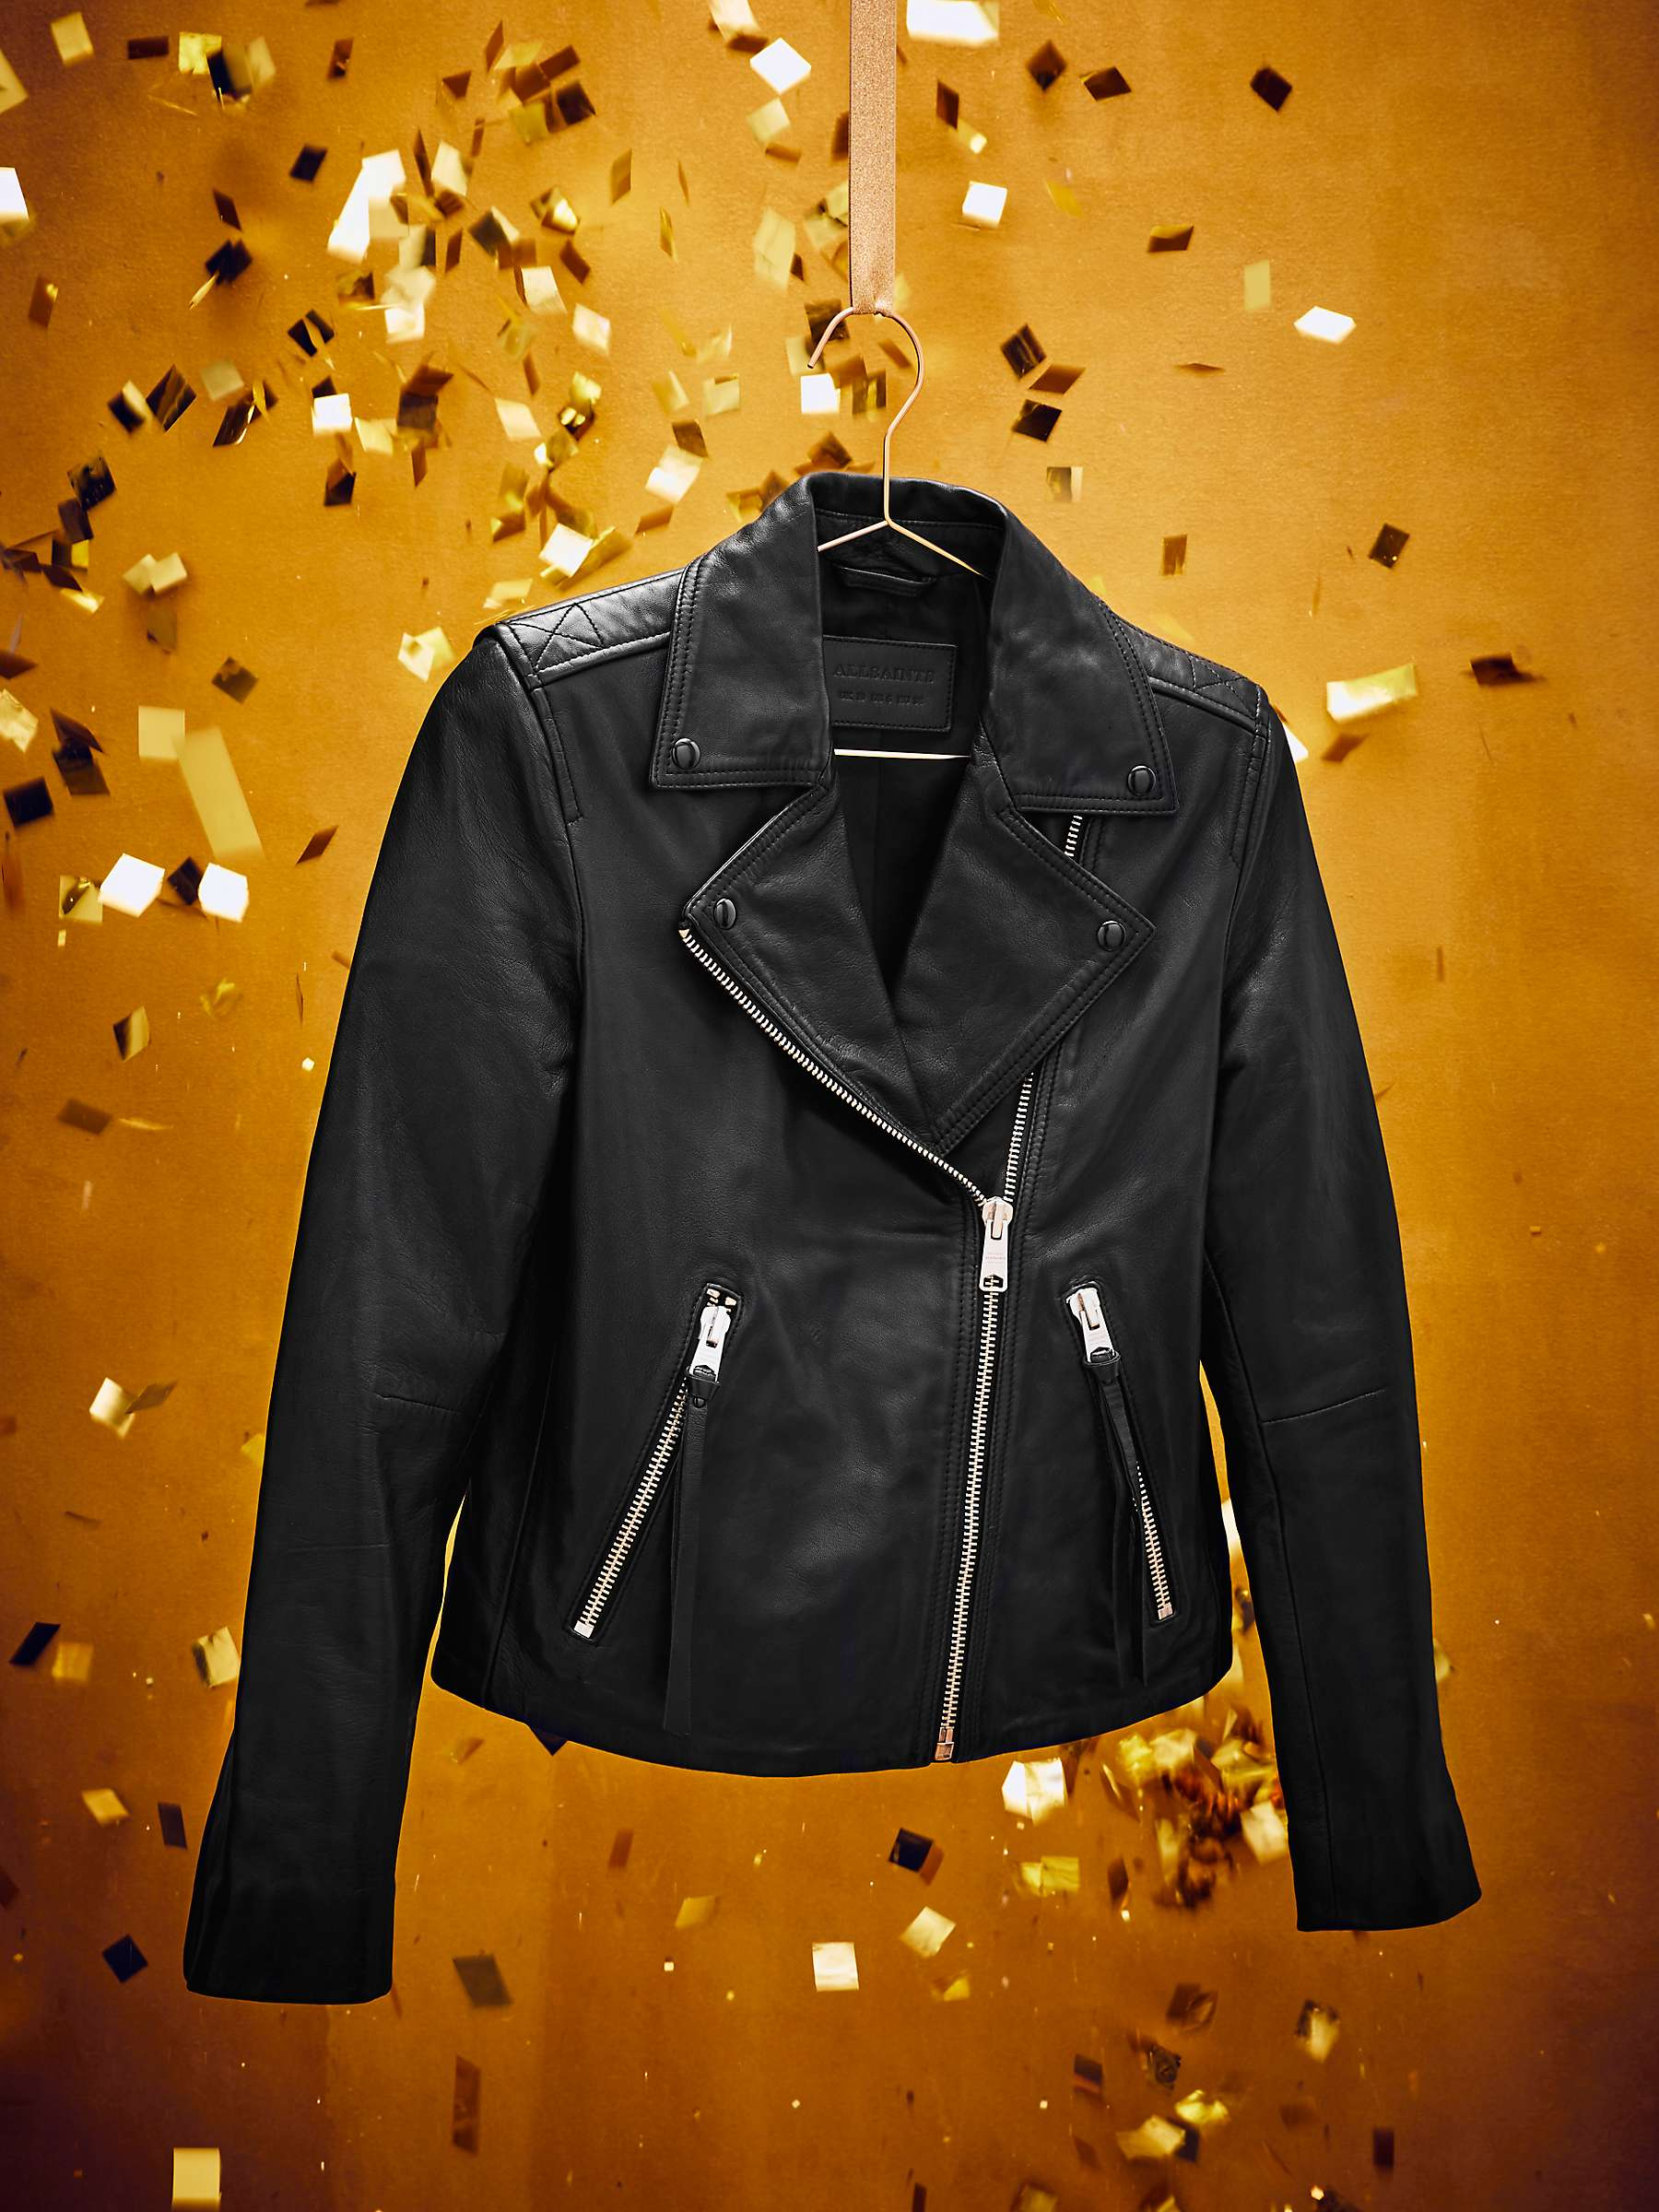 All Saints Dalby Leather Biker Jacket, Black by John Lewis